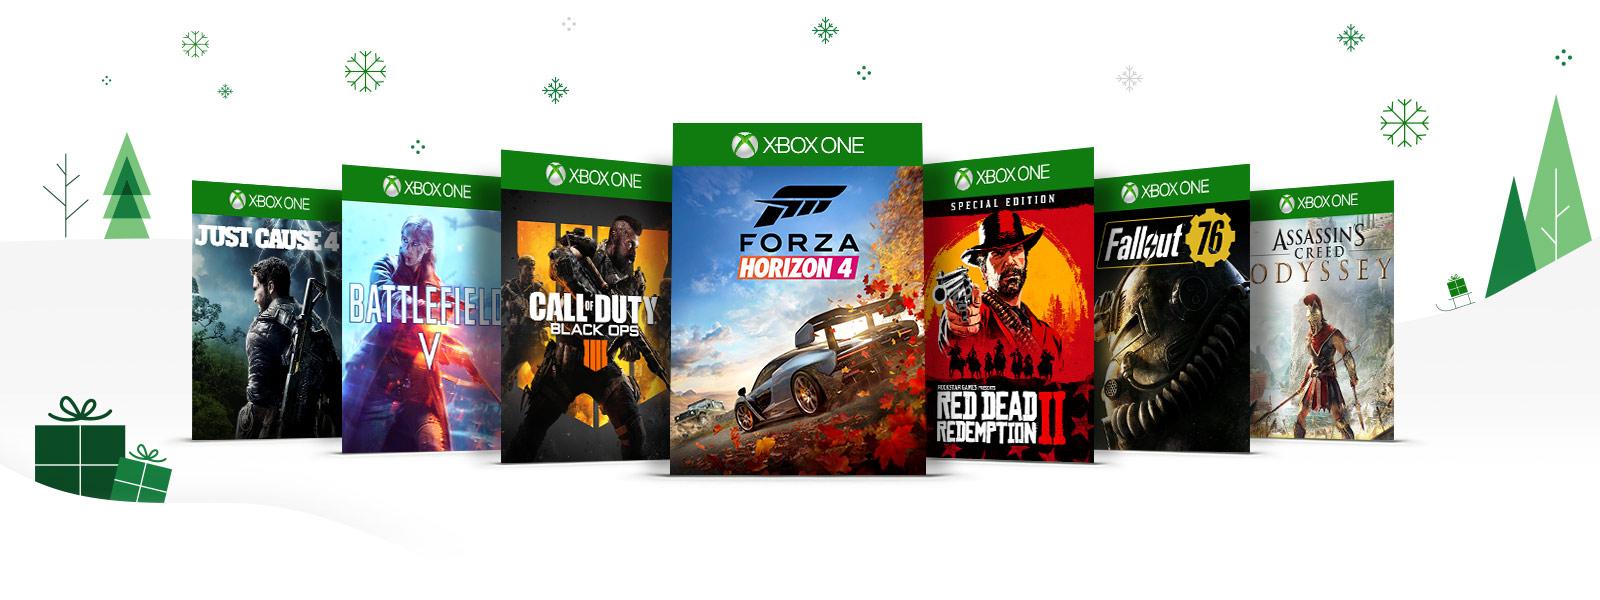 sales specials this week s xbox live deals